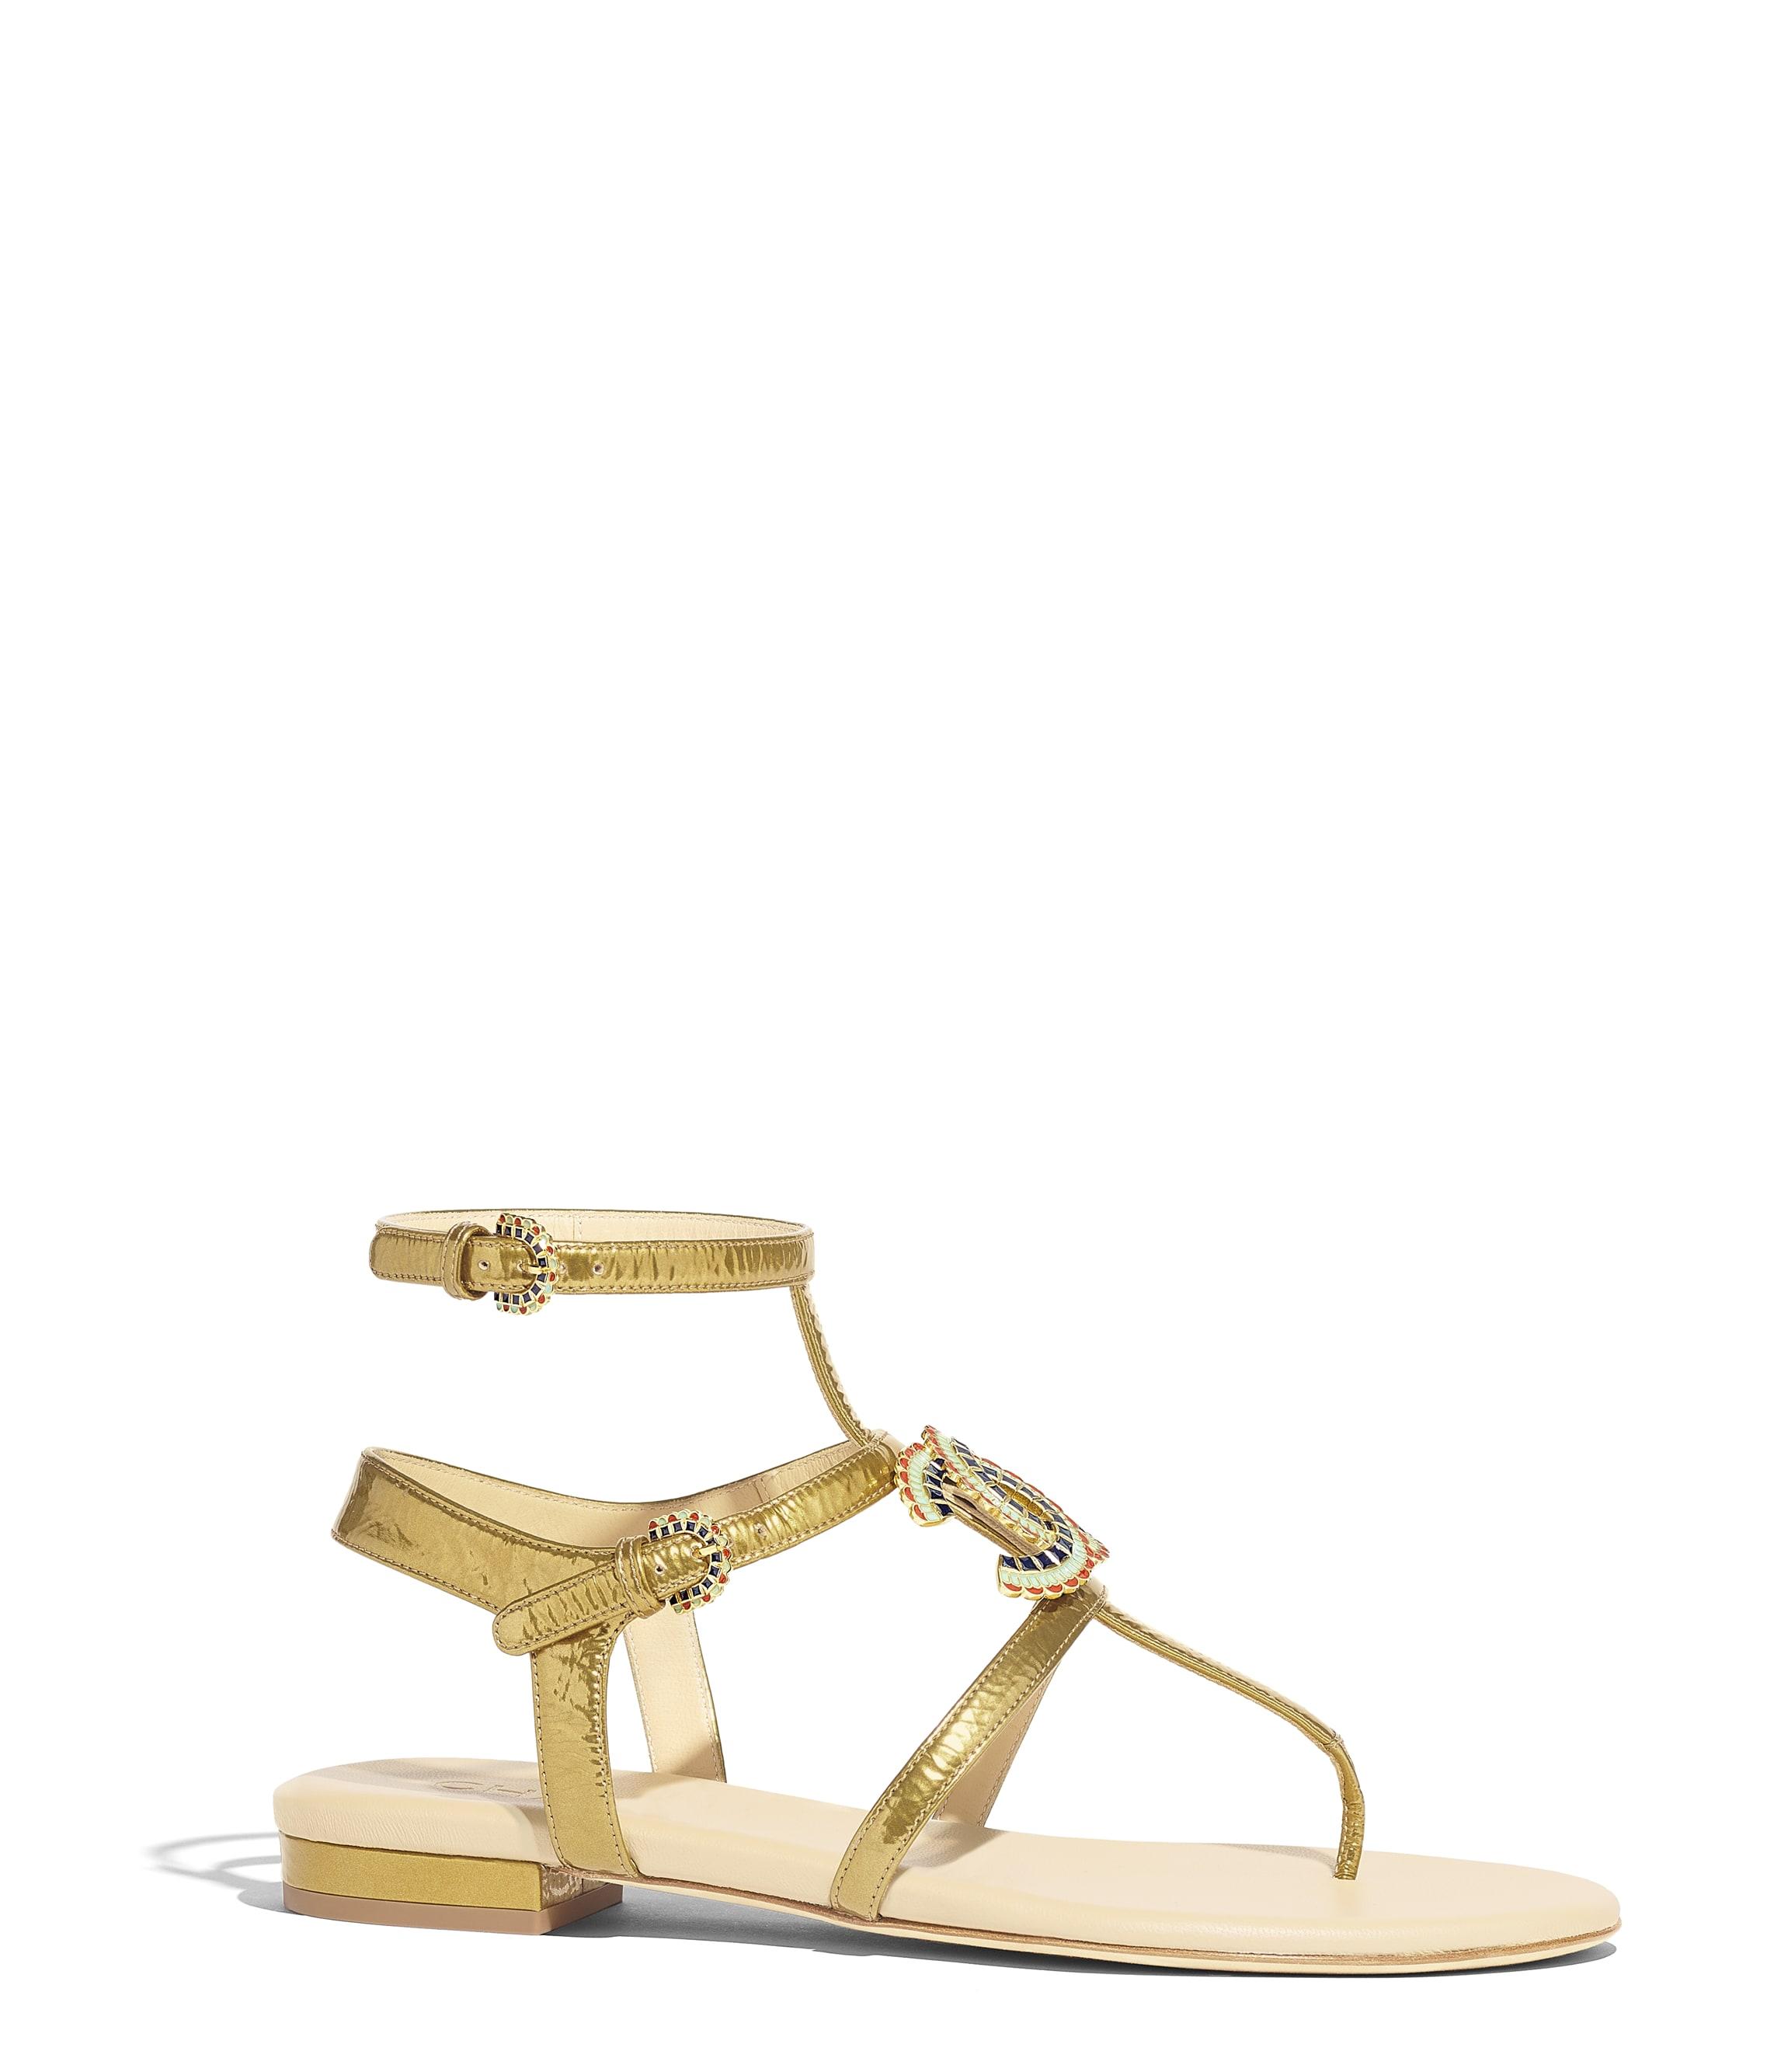 8a2f40d4f Sandals - Shoes - CHANEL